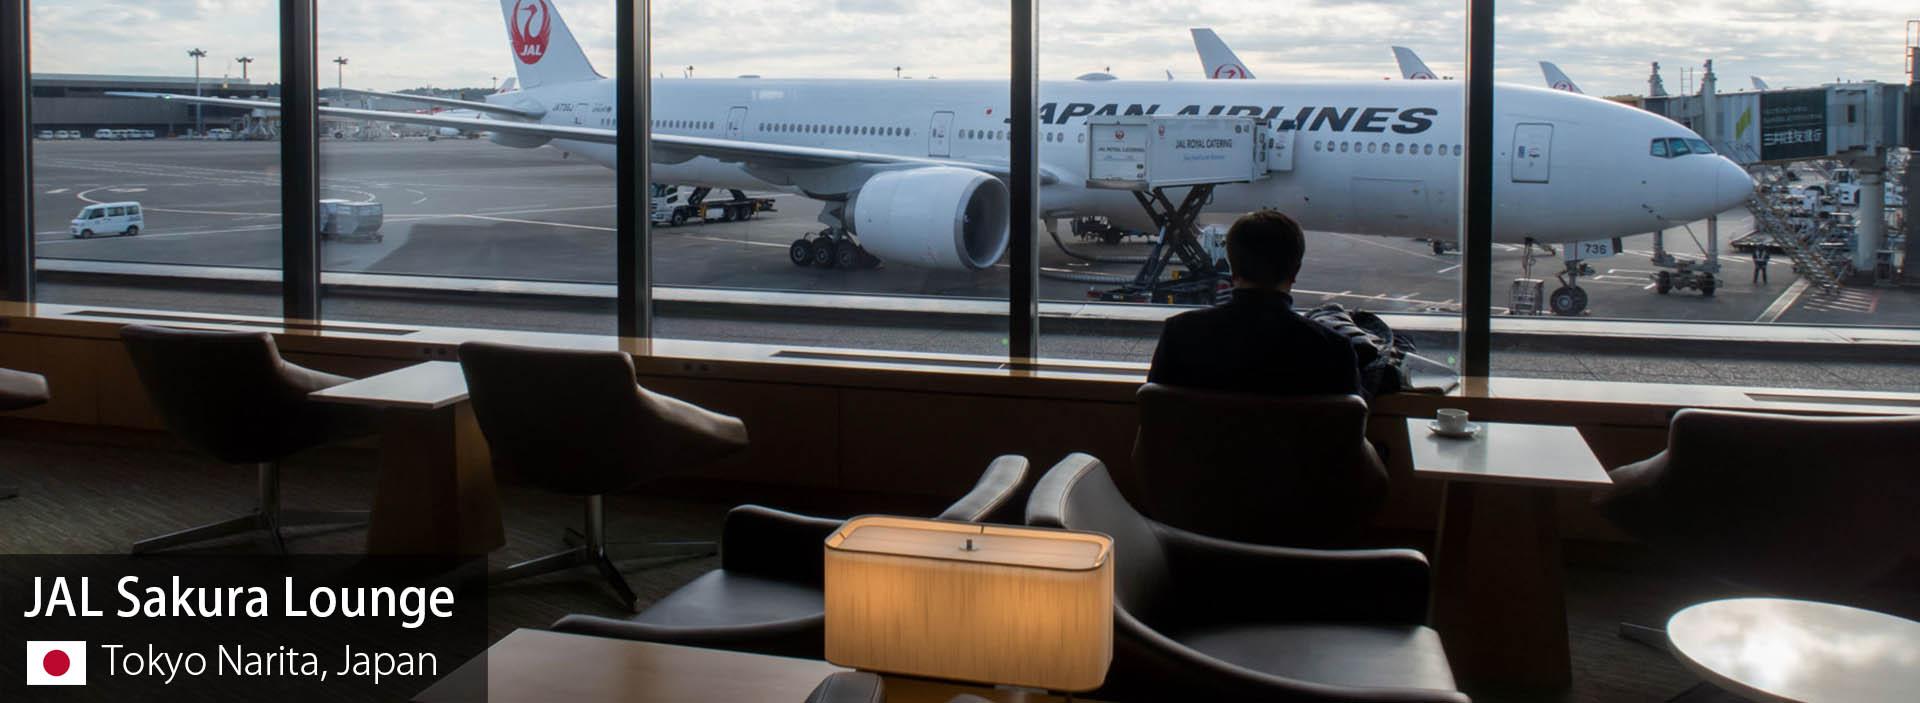 Review: JAL Sakura Lounge (International - Main Terminal) at Tokyo Narita